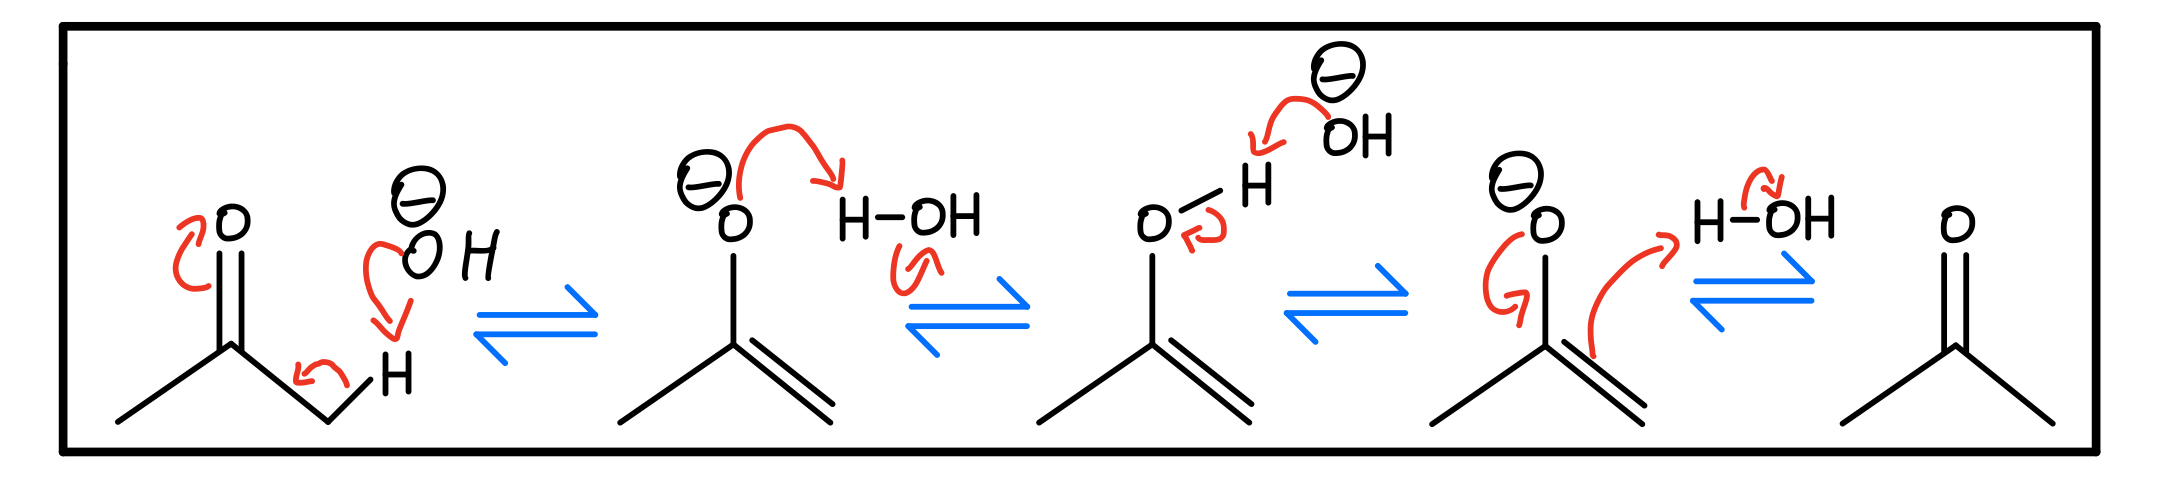 Base-catalyzed-mechanism